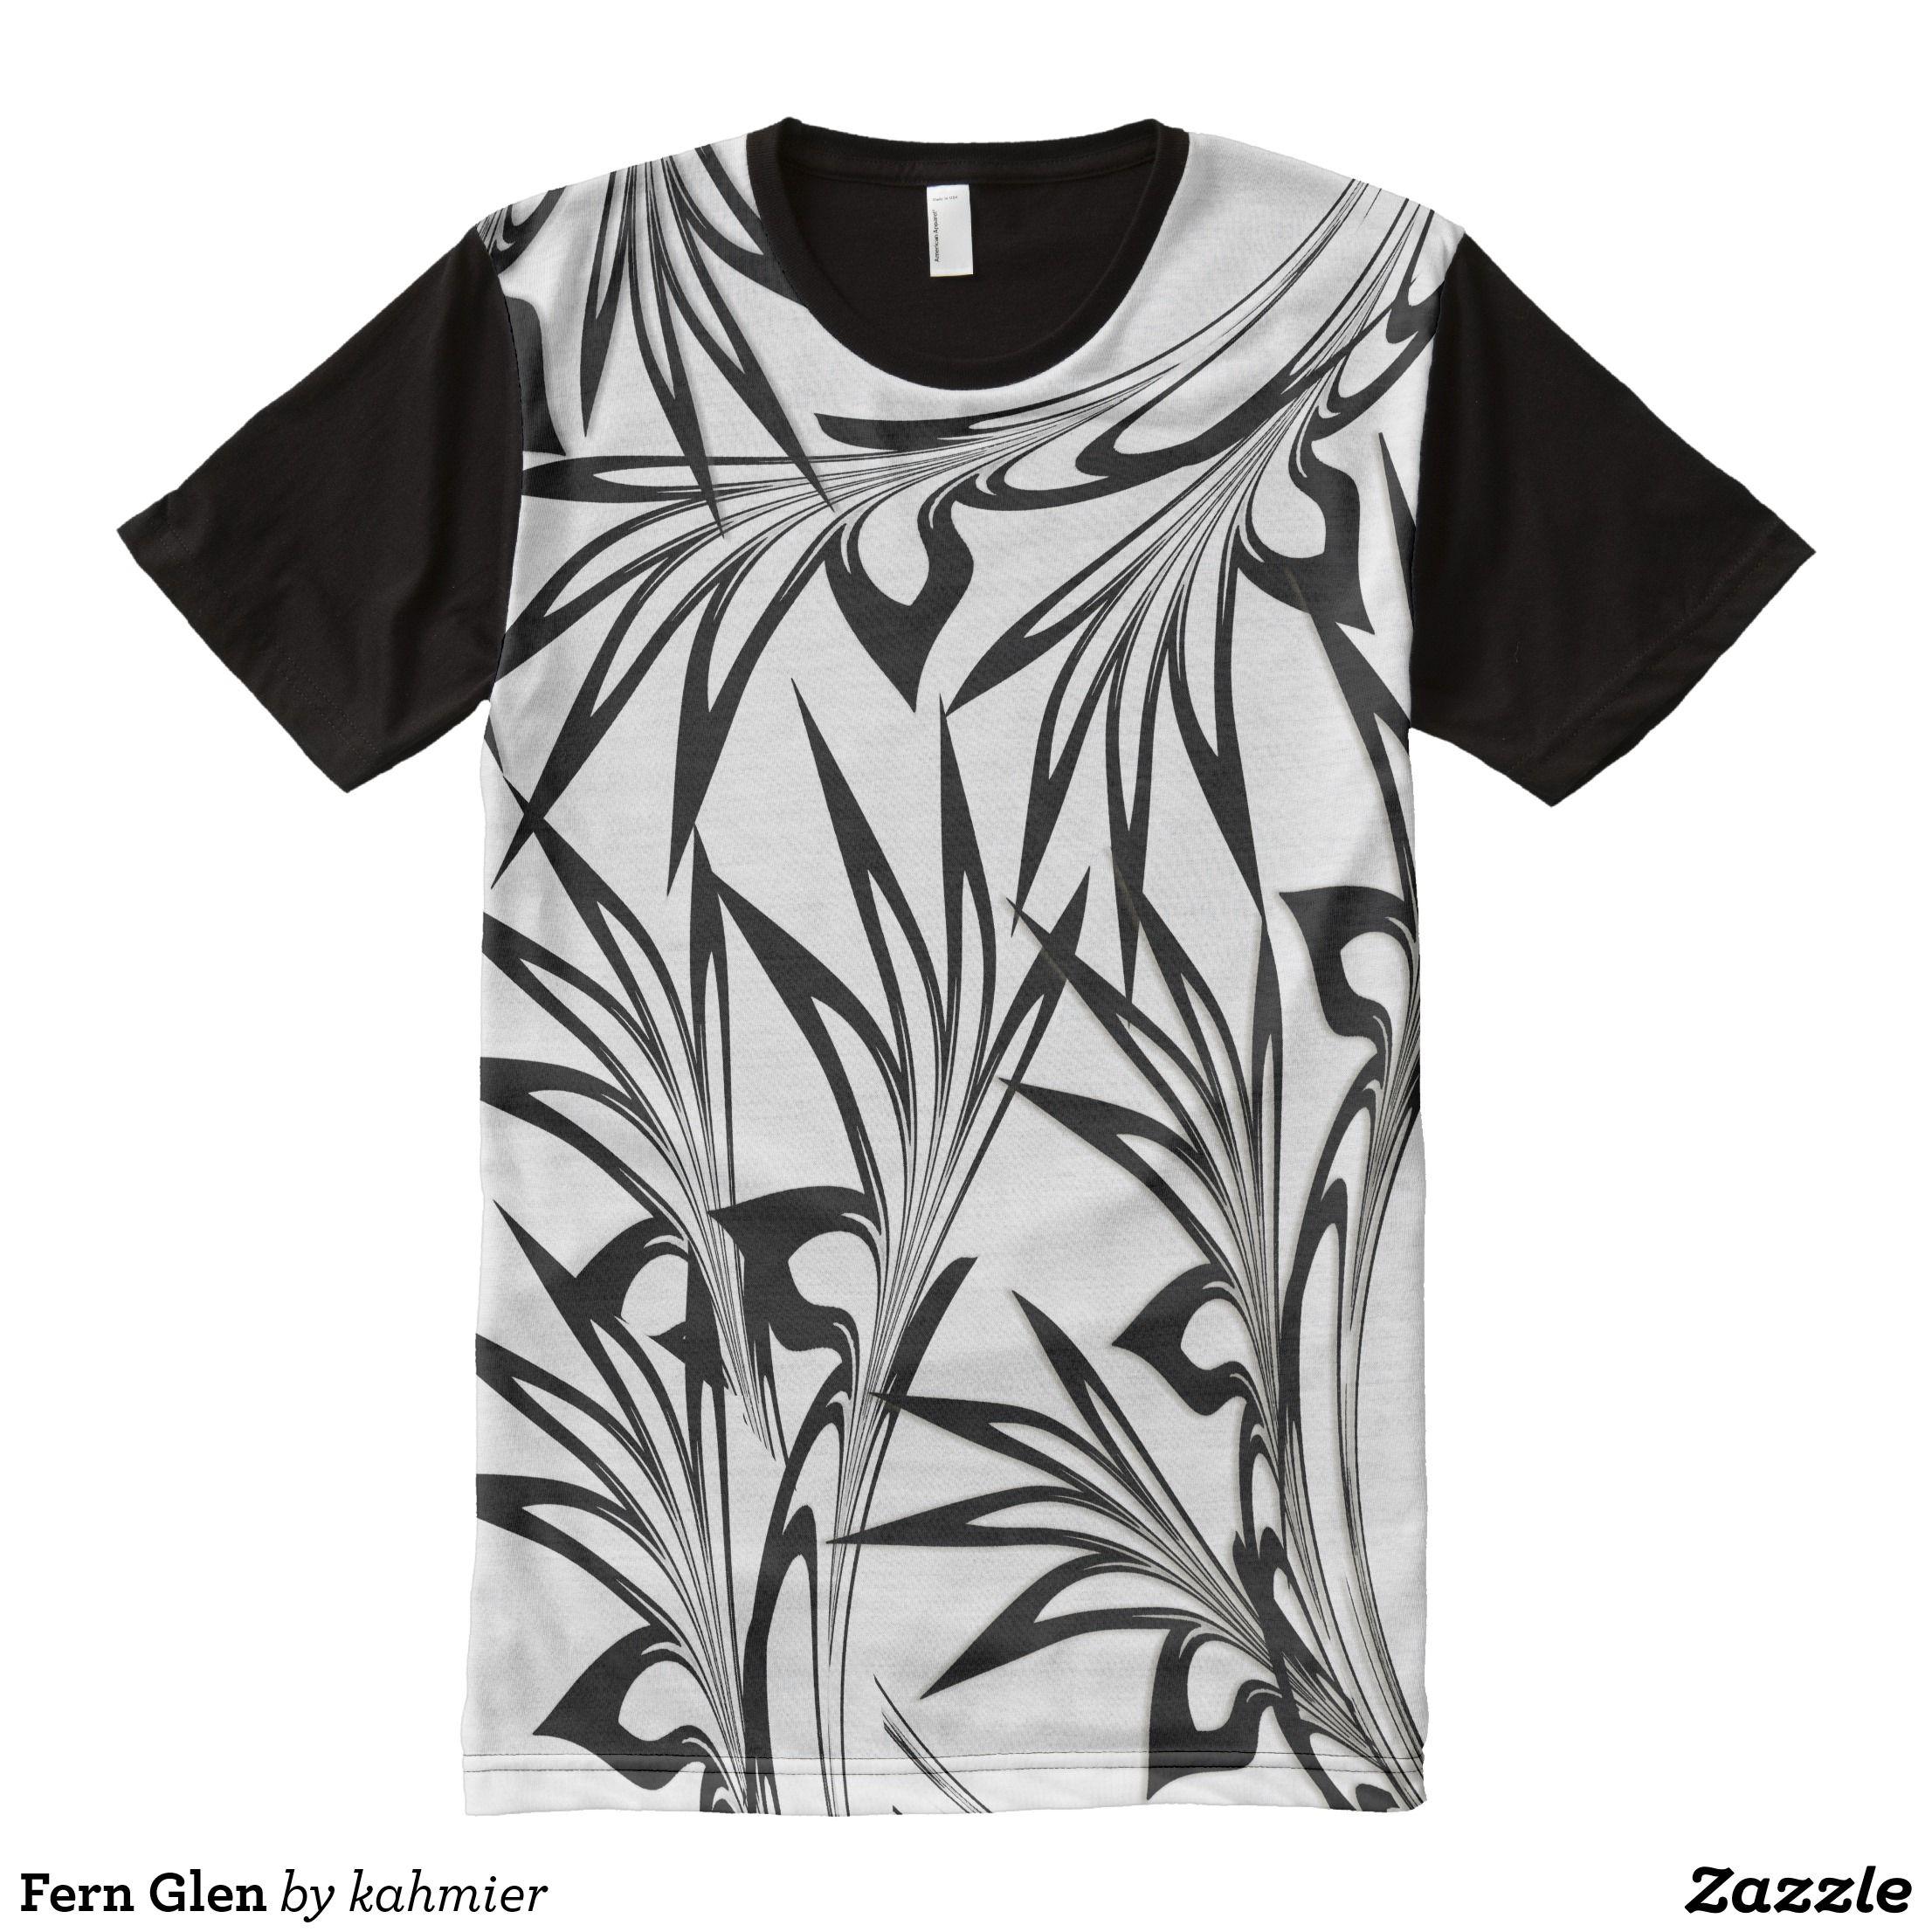 Fern Glen All Over Print T Shirt Visually Stunning Graphic T